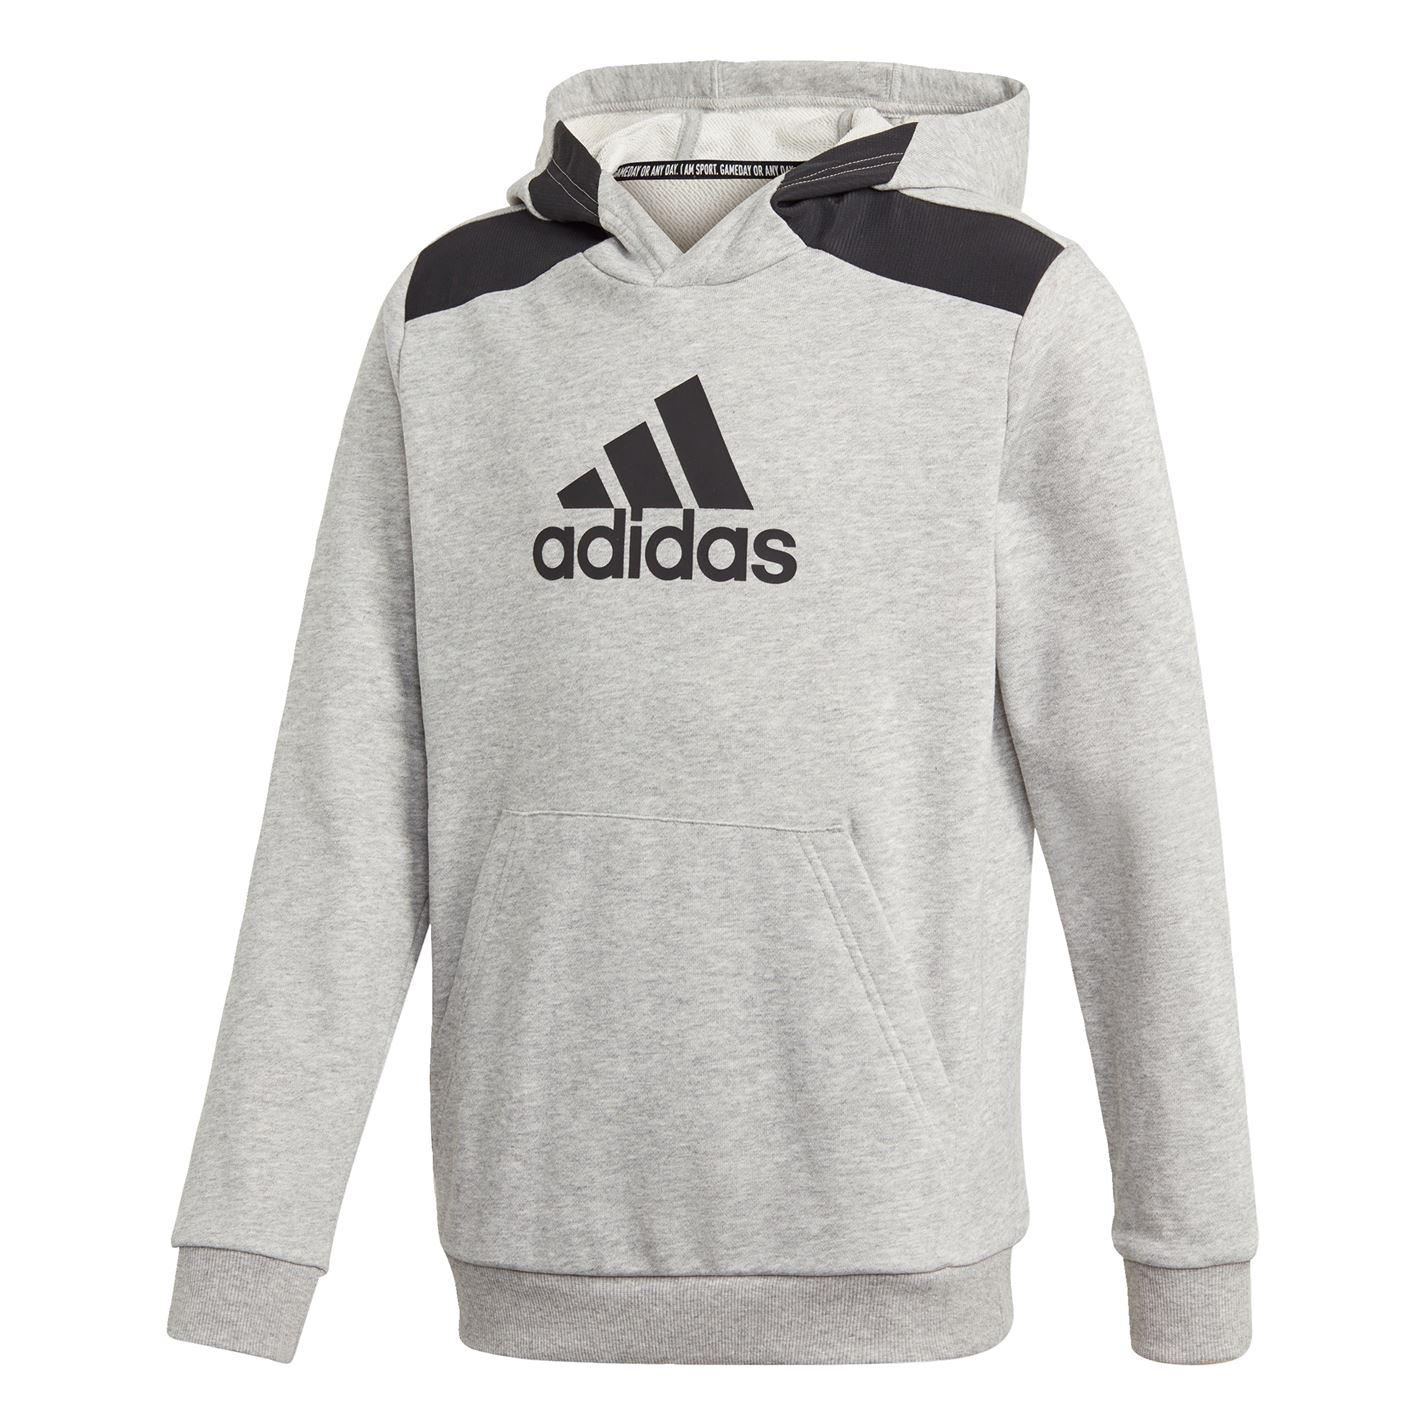 Adidas Logo Hoodie Kids